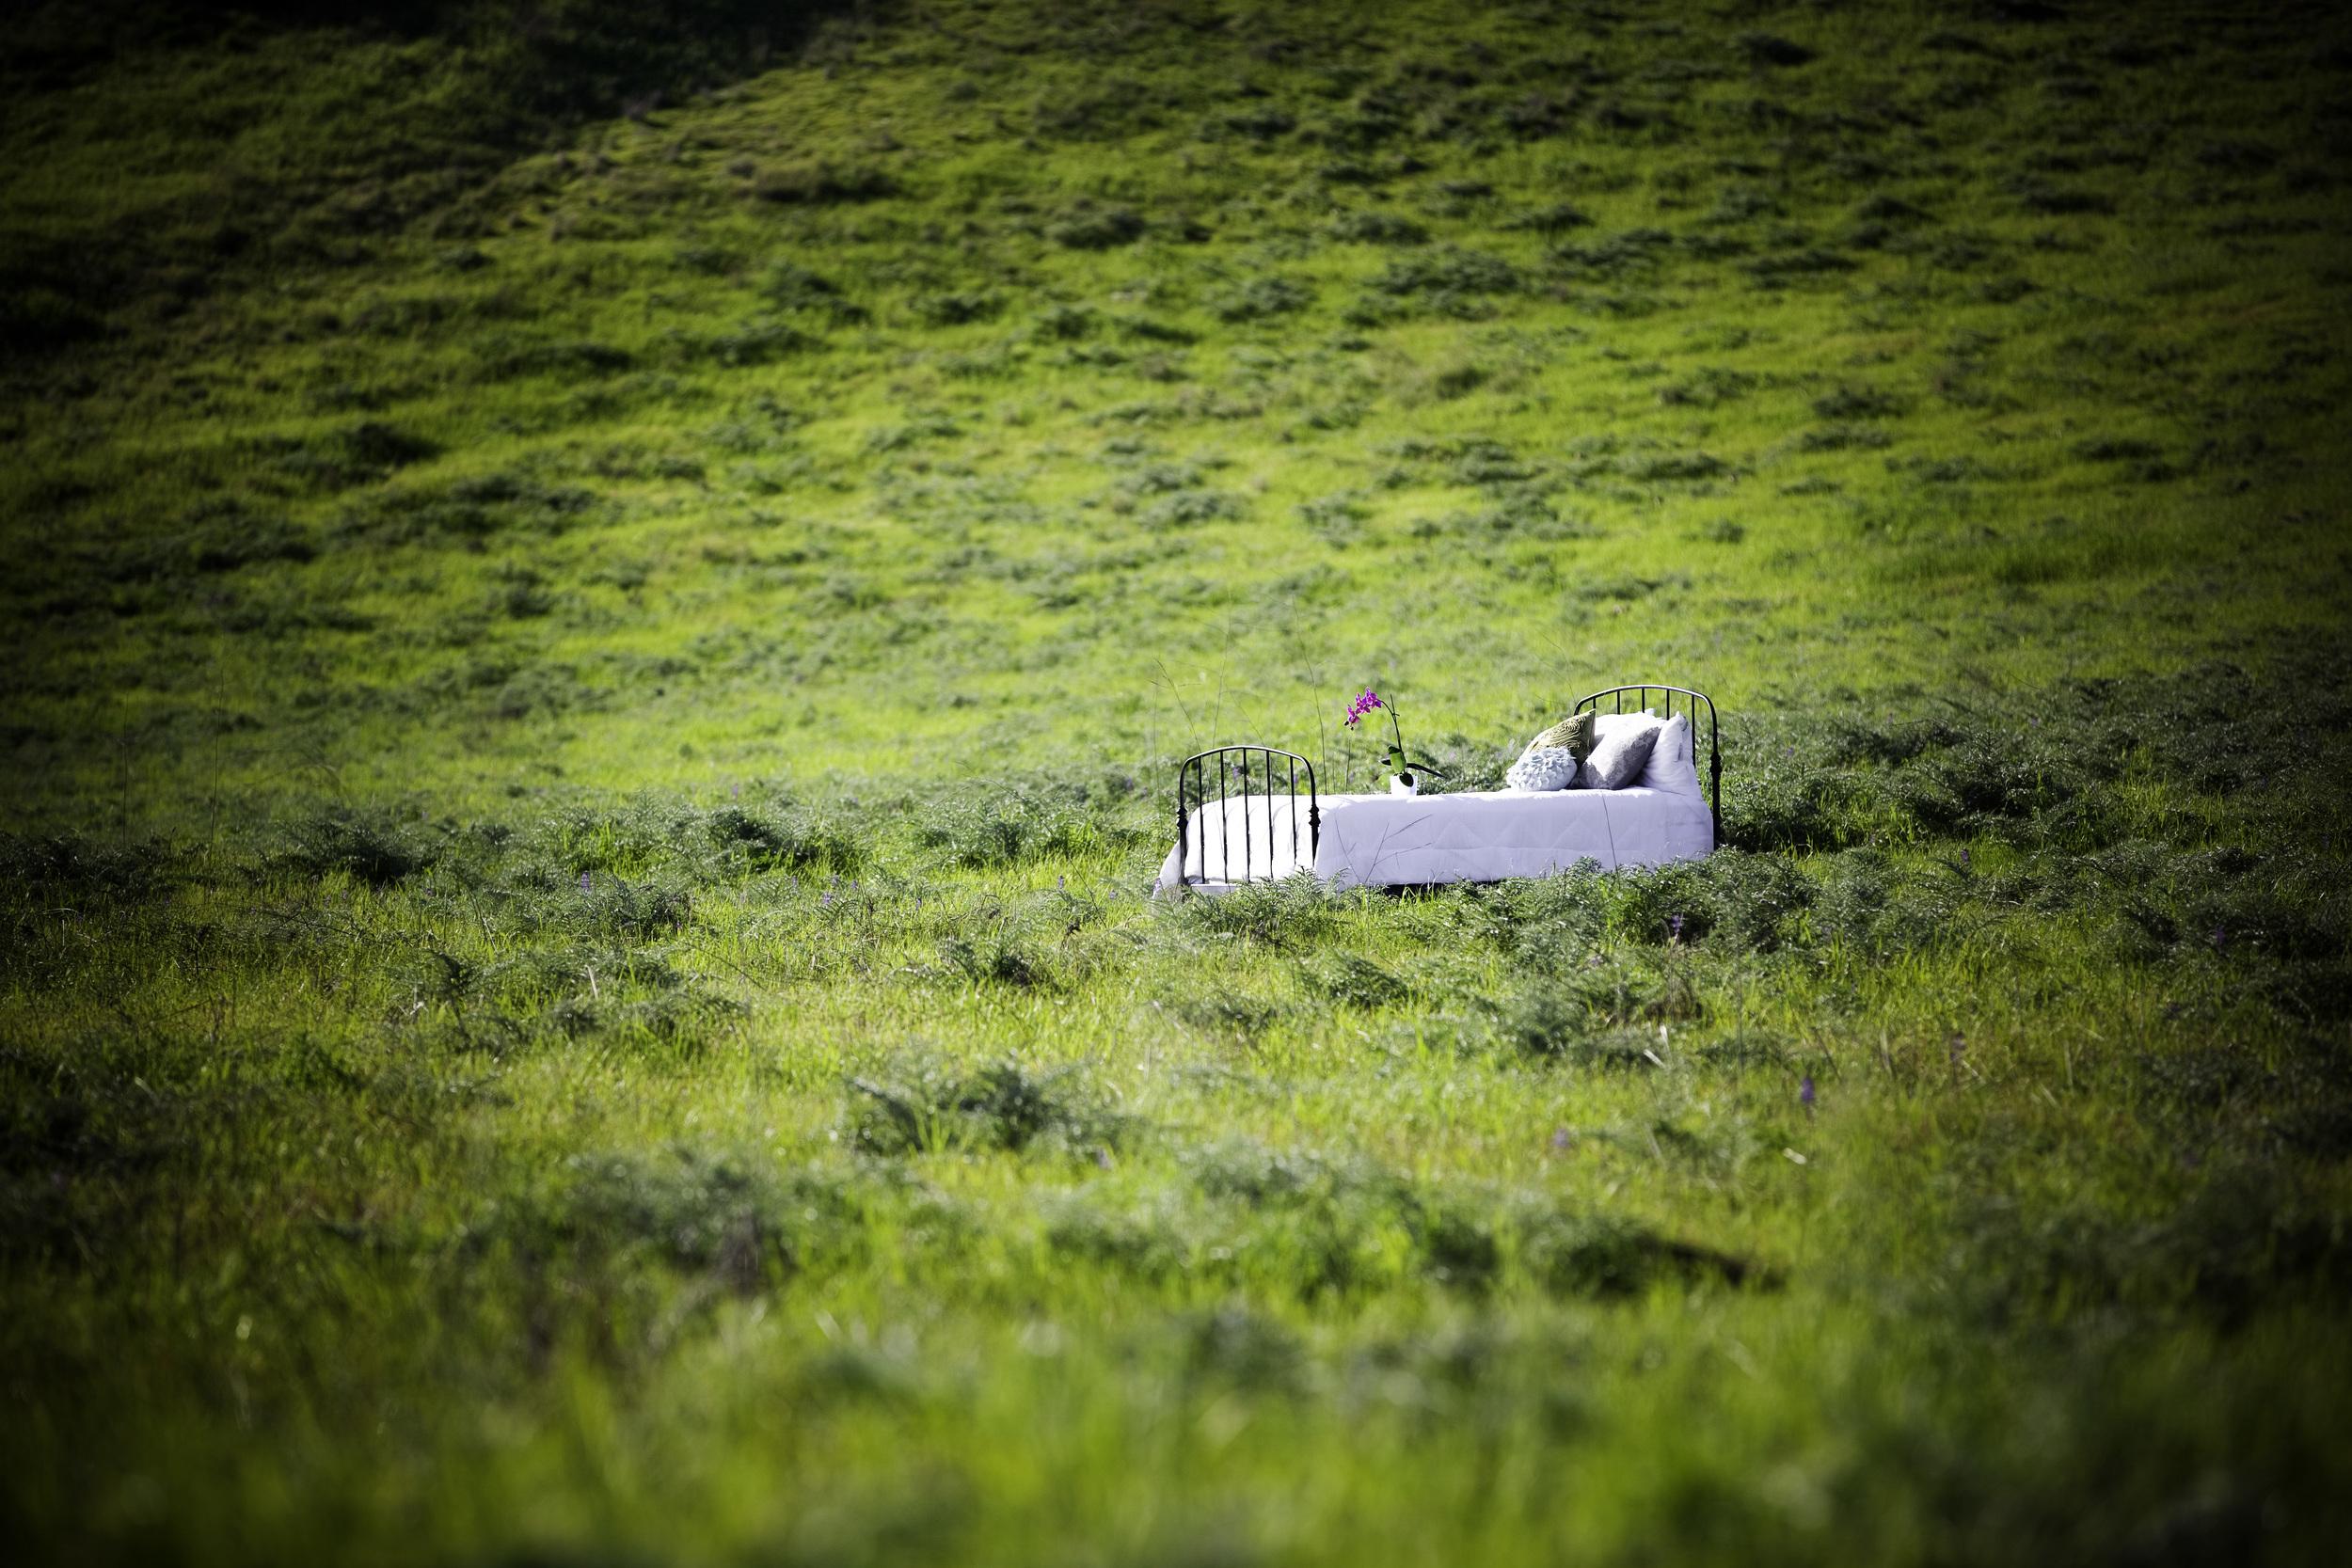 Bed in Field - General.jpg